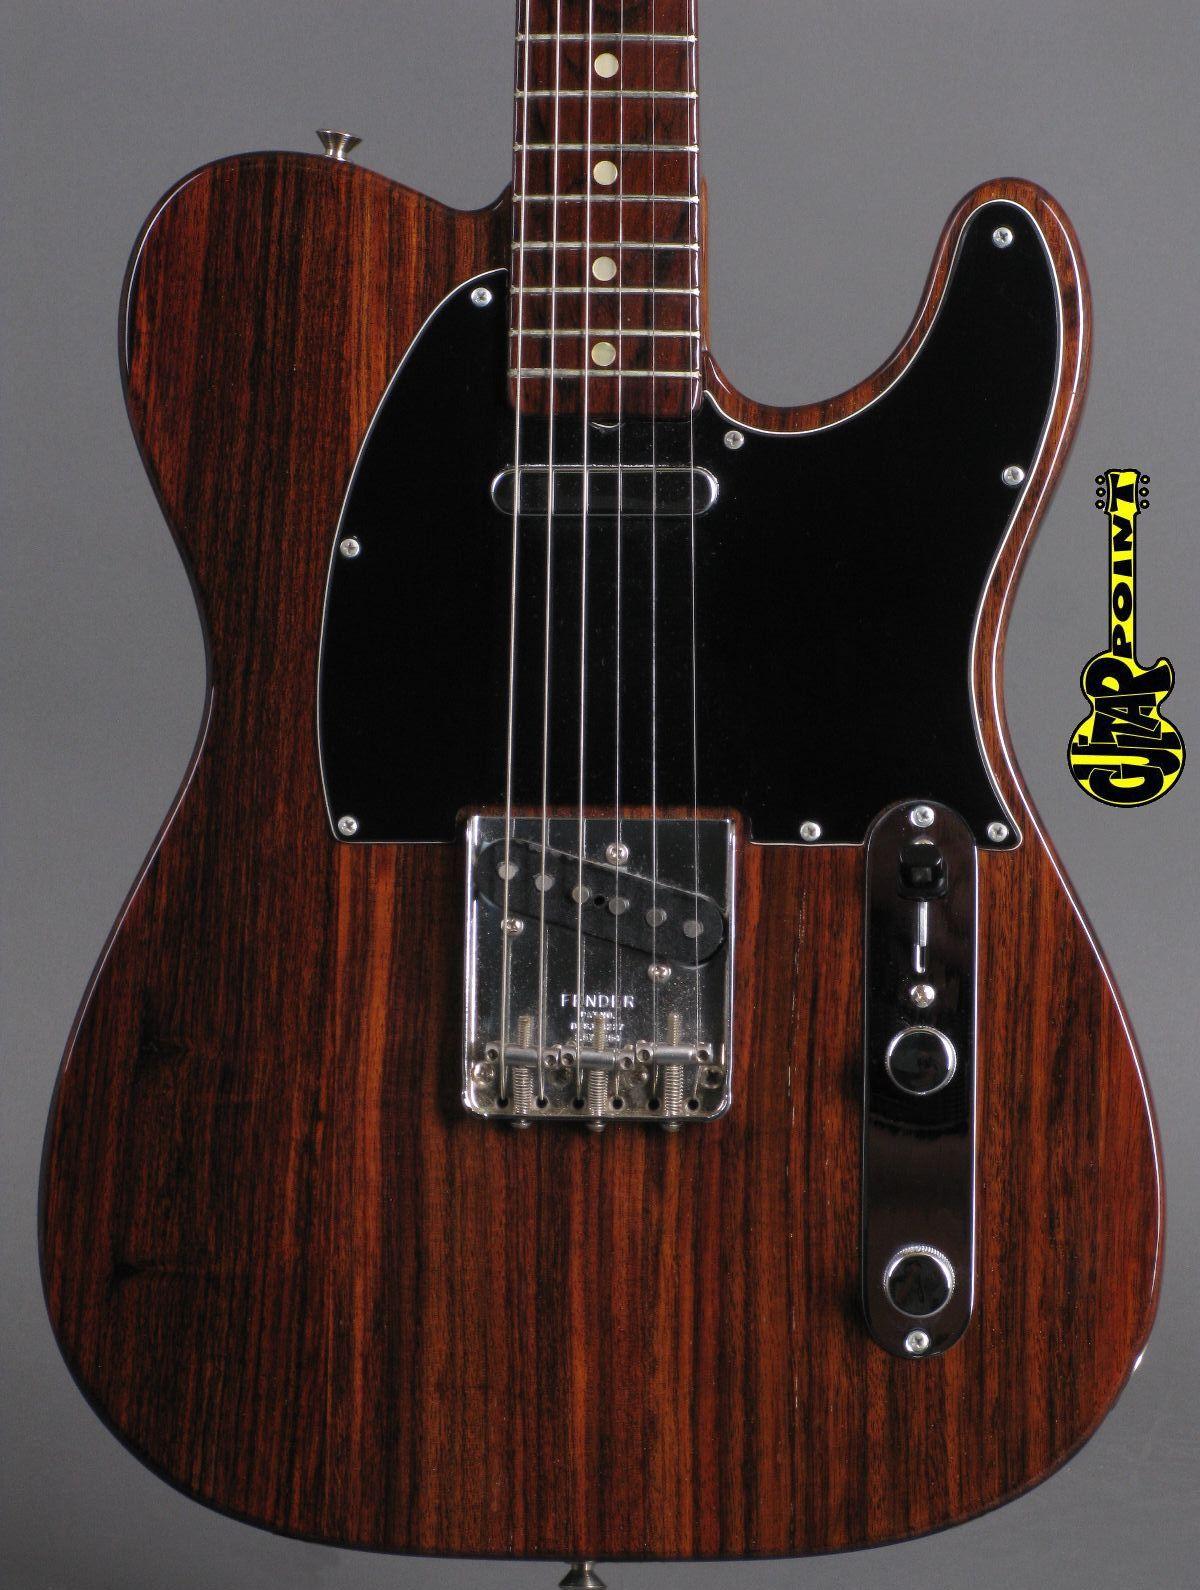 1969 Fender Telecaster - Rosewood